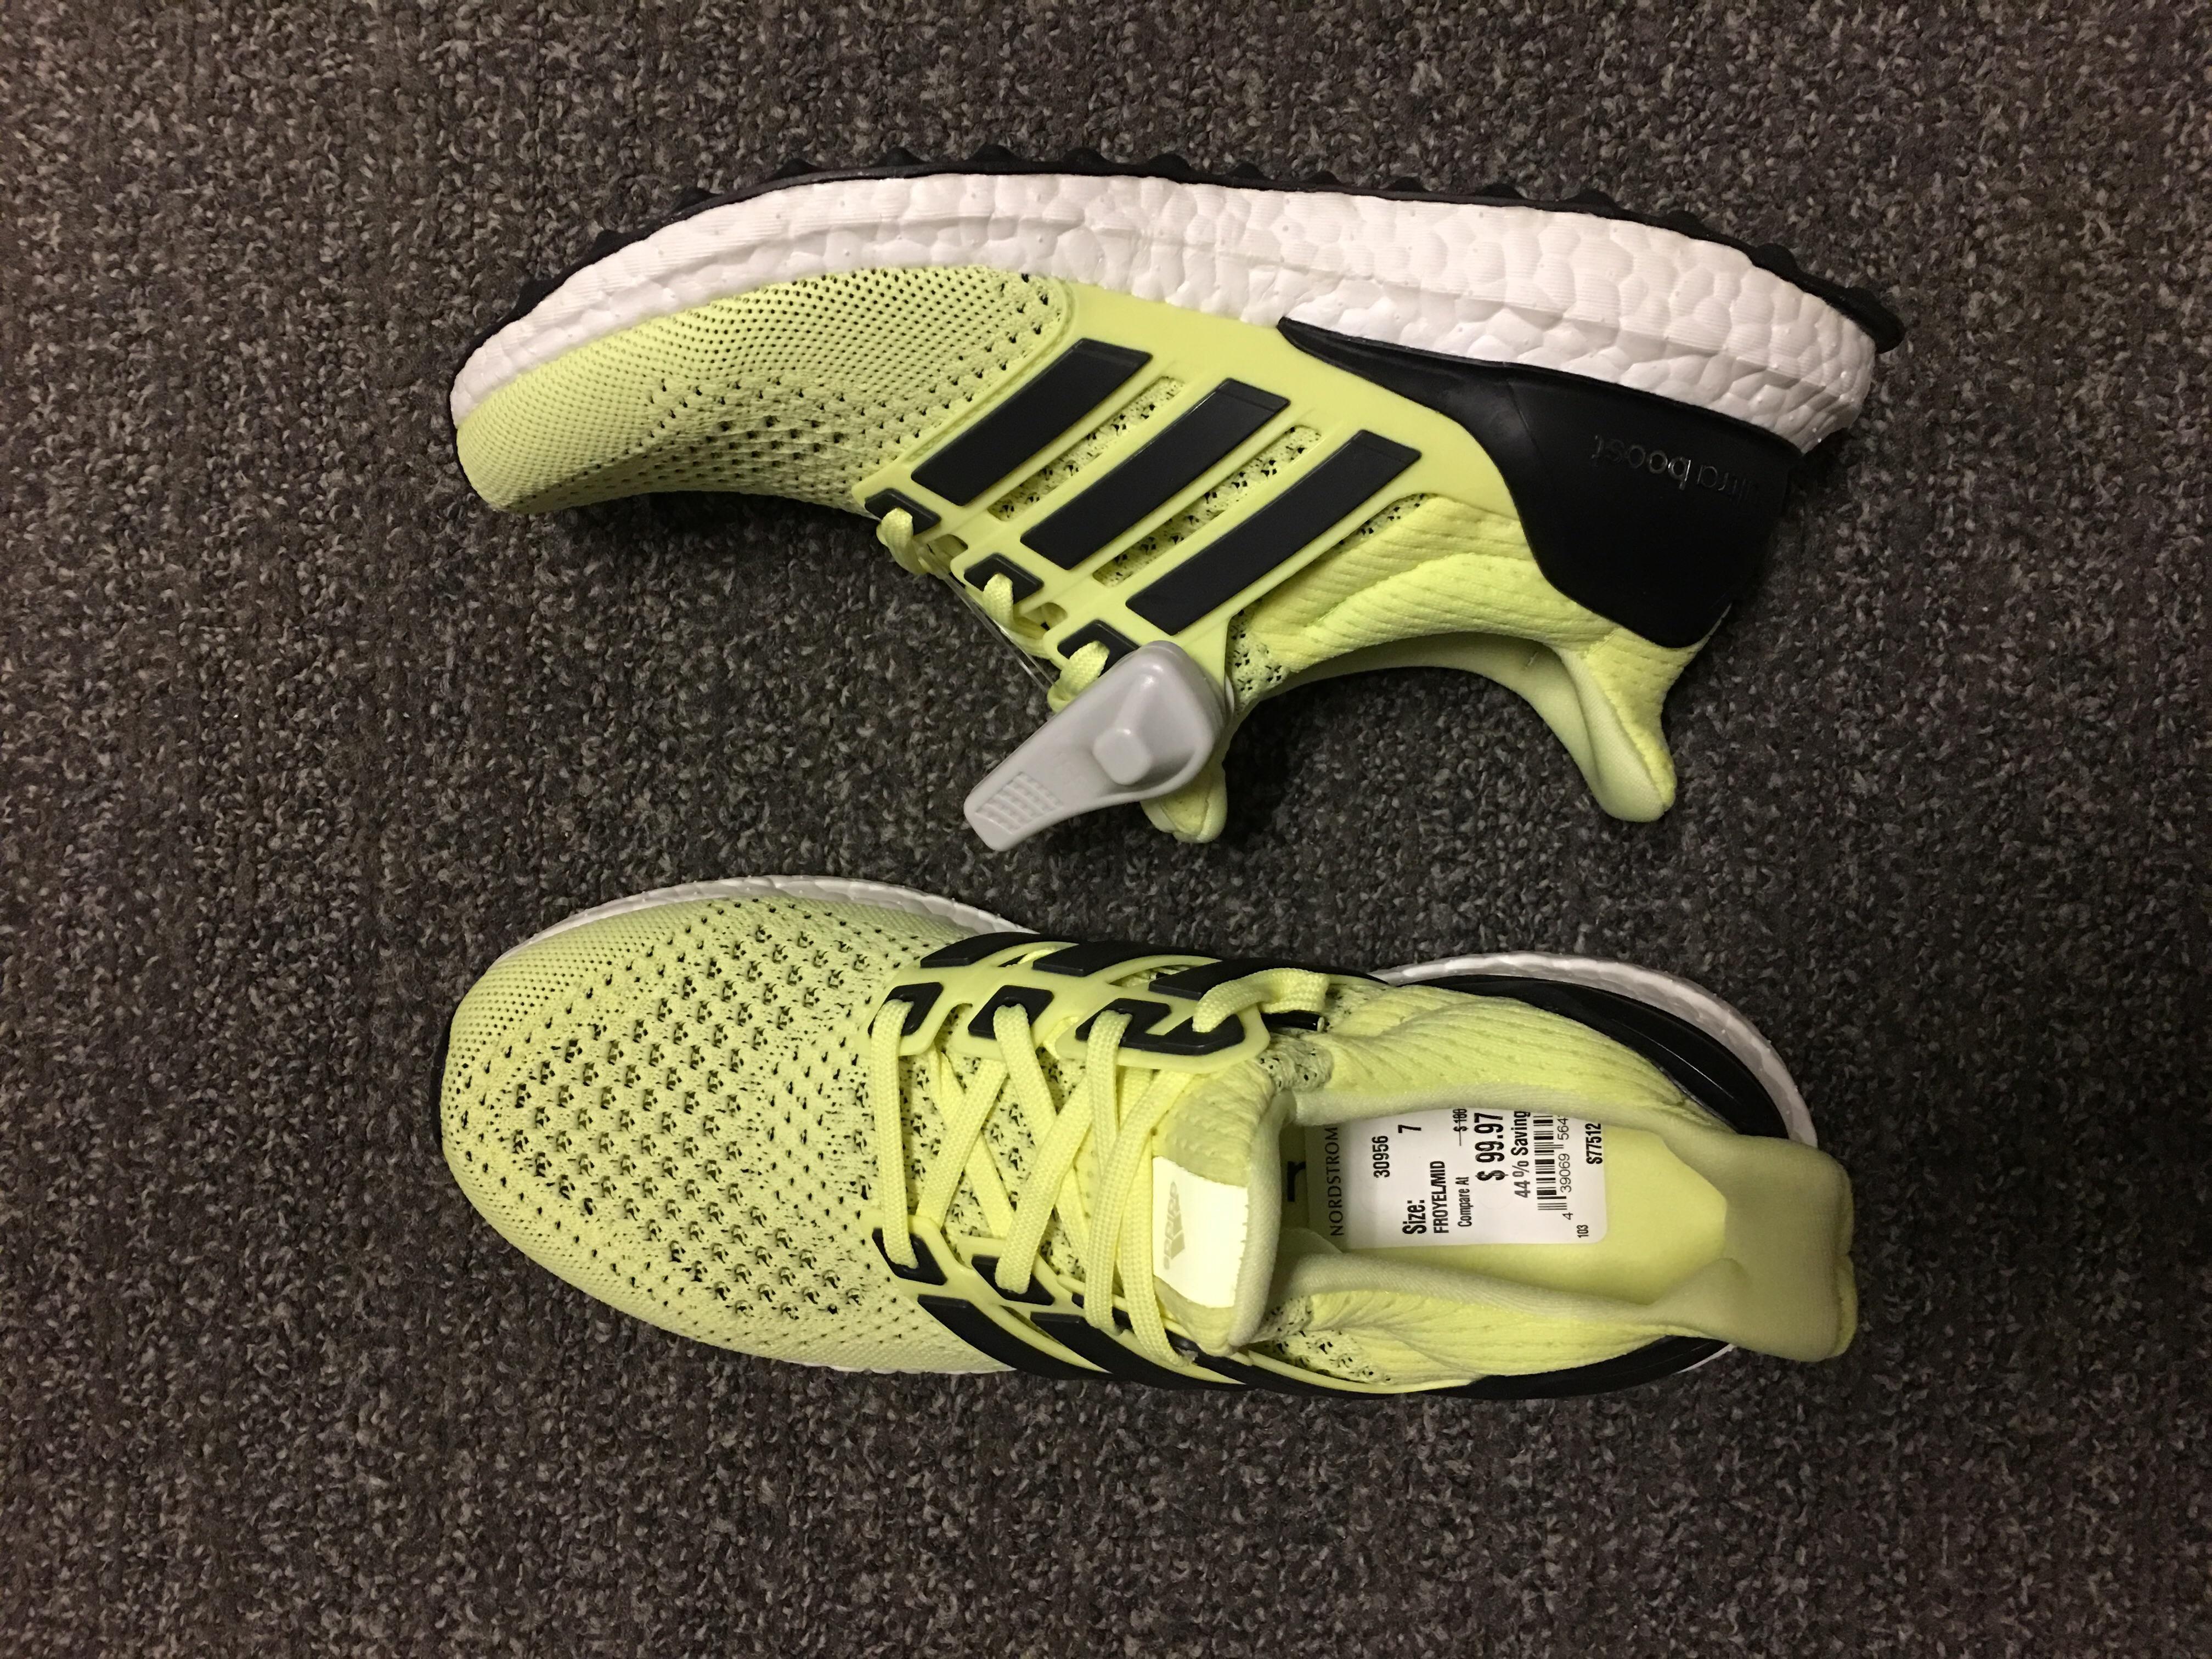 nordstrom rack finds sneakers